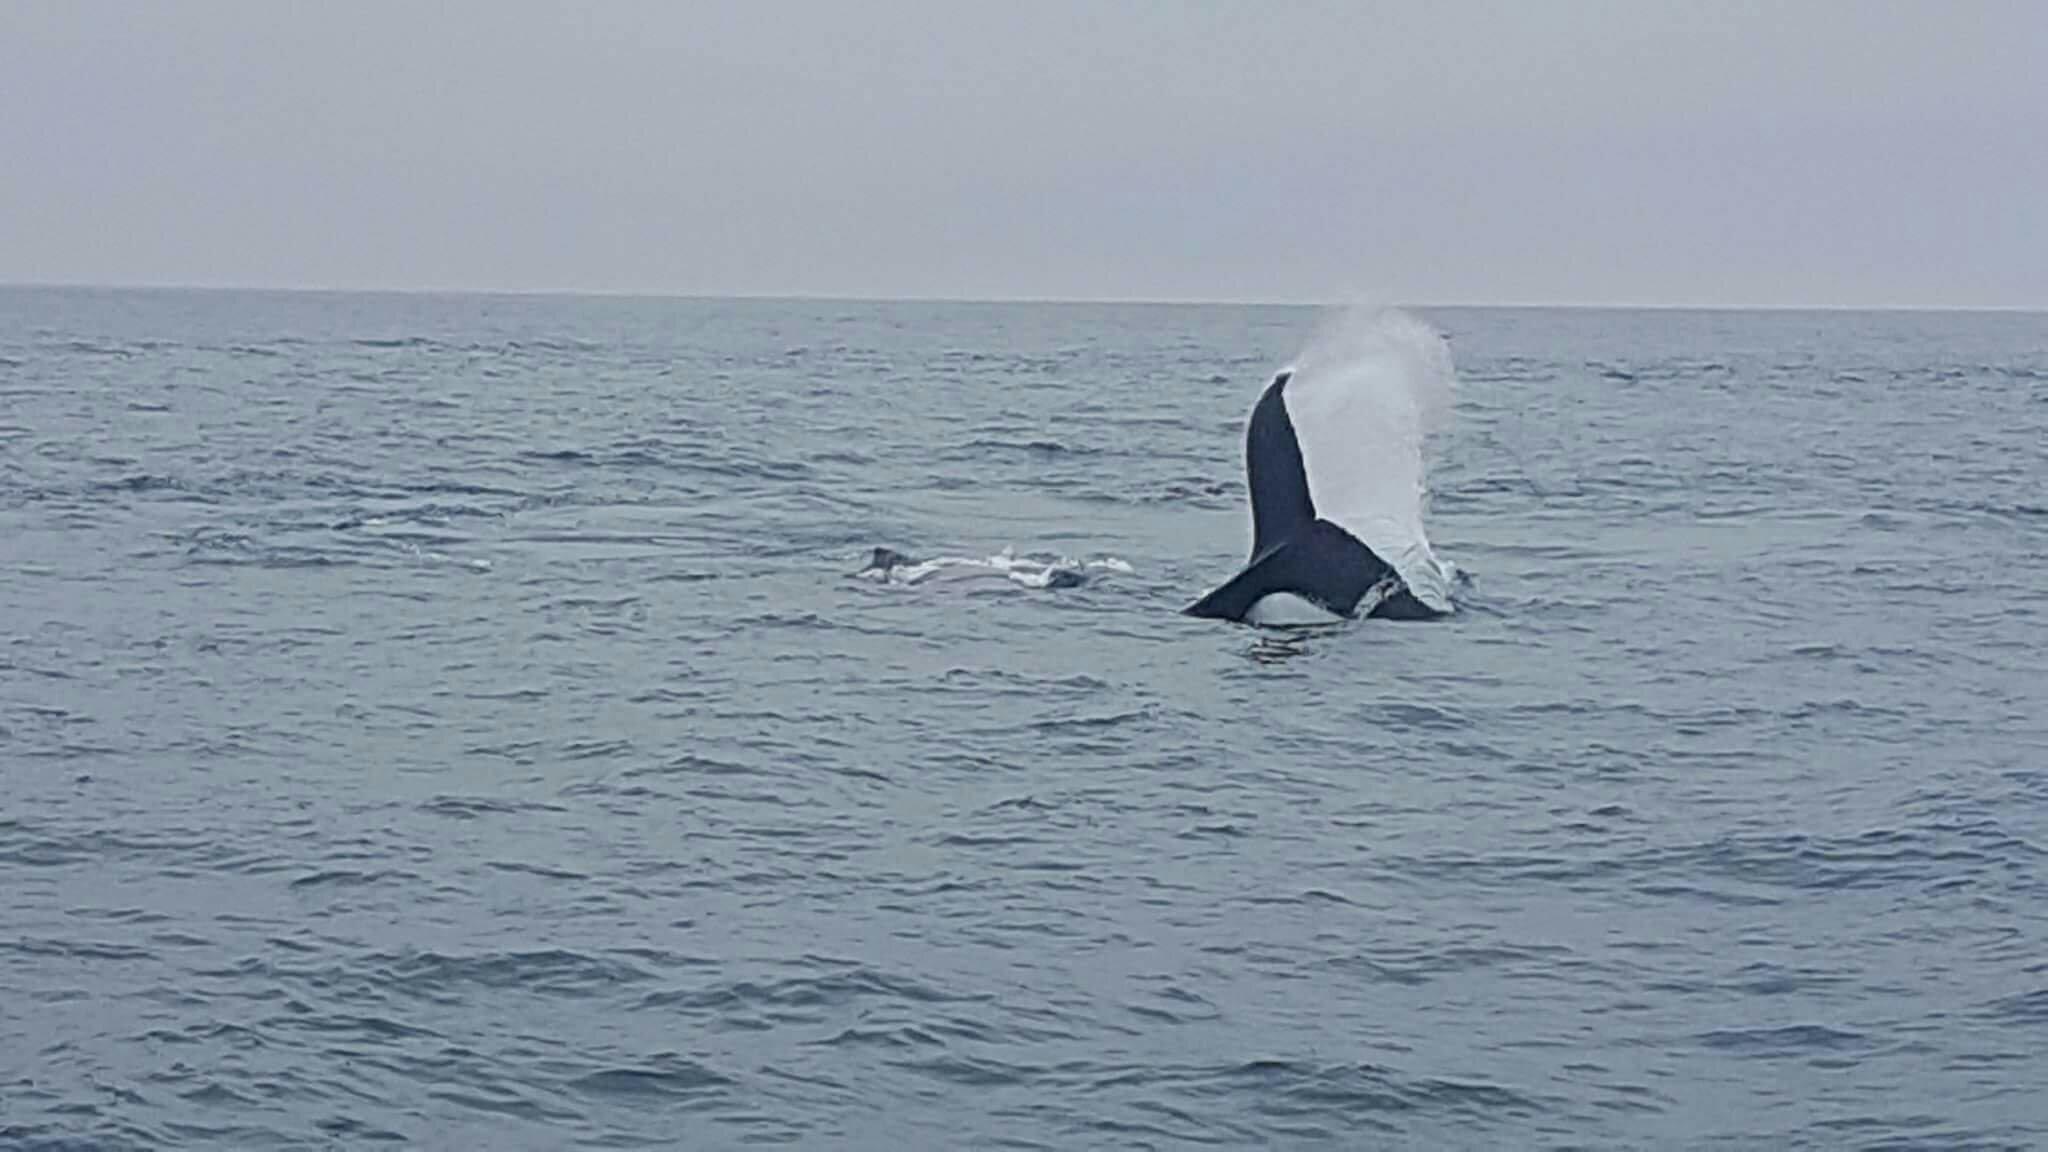 "<img src=""images/"" width=""800"" height=""600"" alt=""puerto lópez - received 10154779618555636 52523866 - Ecuador: Whale Watching in Puerto López"">"